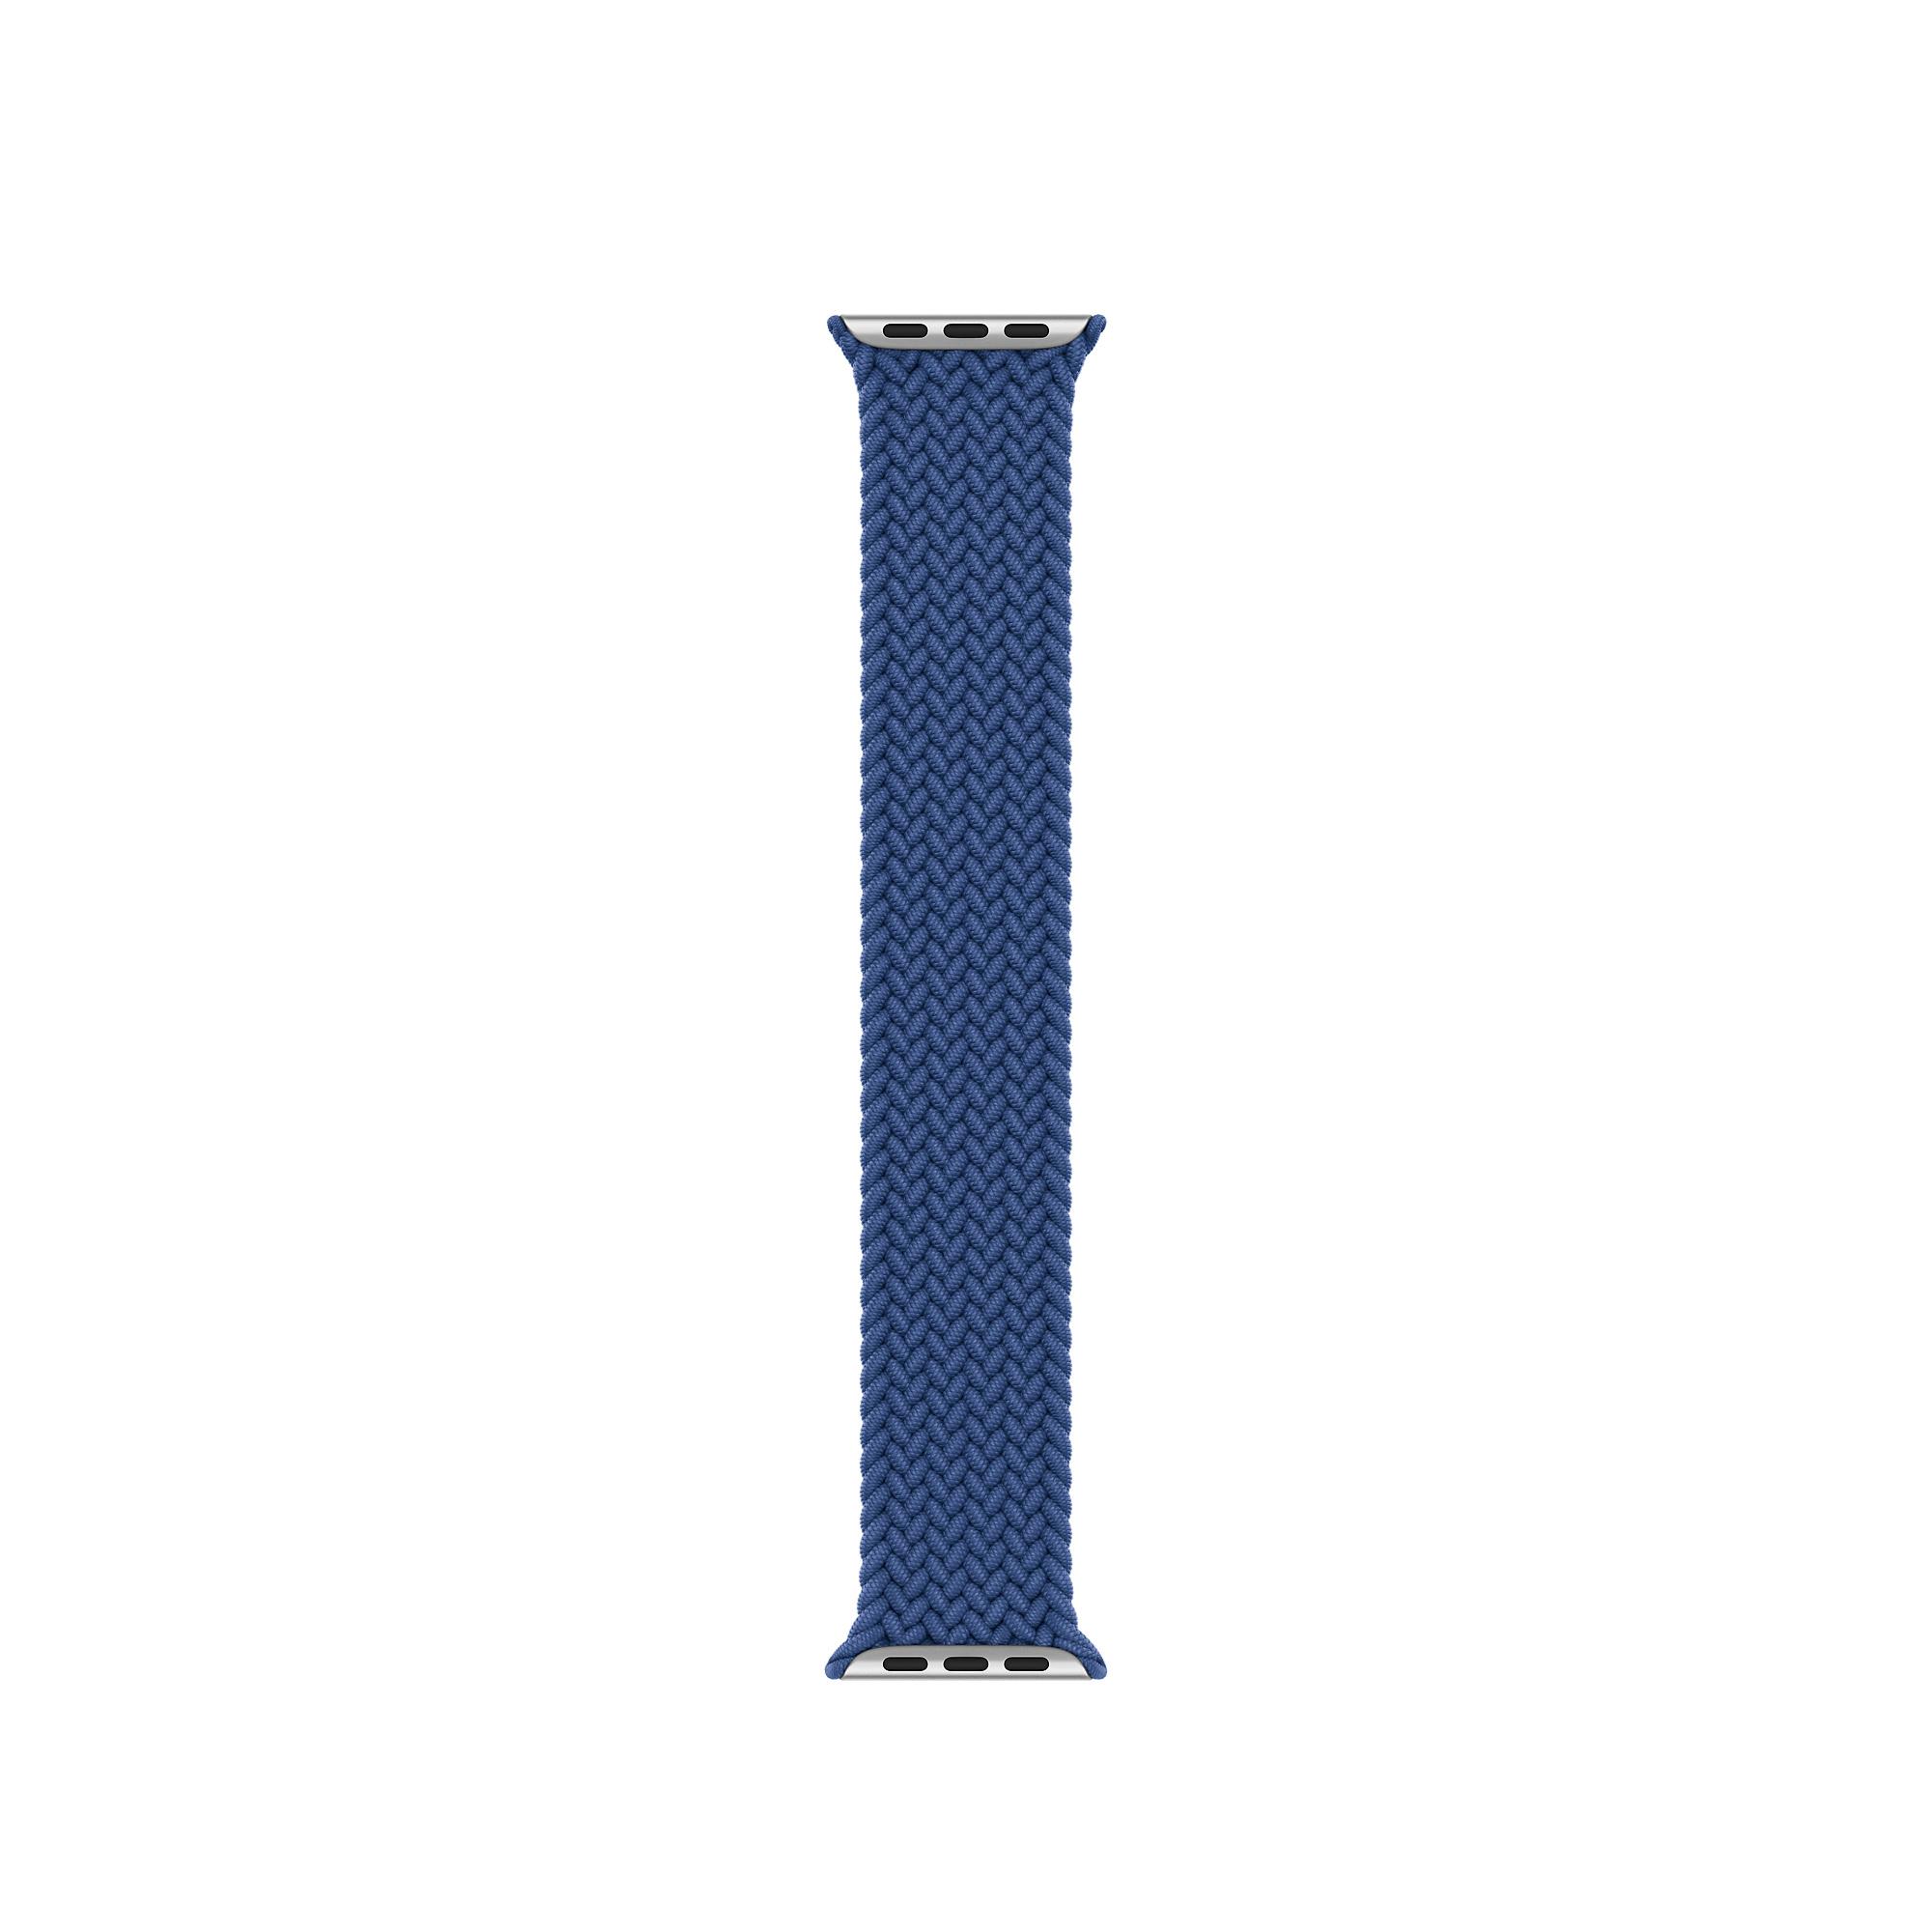 Pulseira LOOP Nylon Trançado Azul 42/44mm M